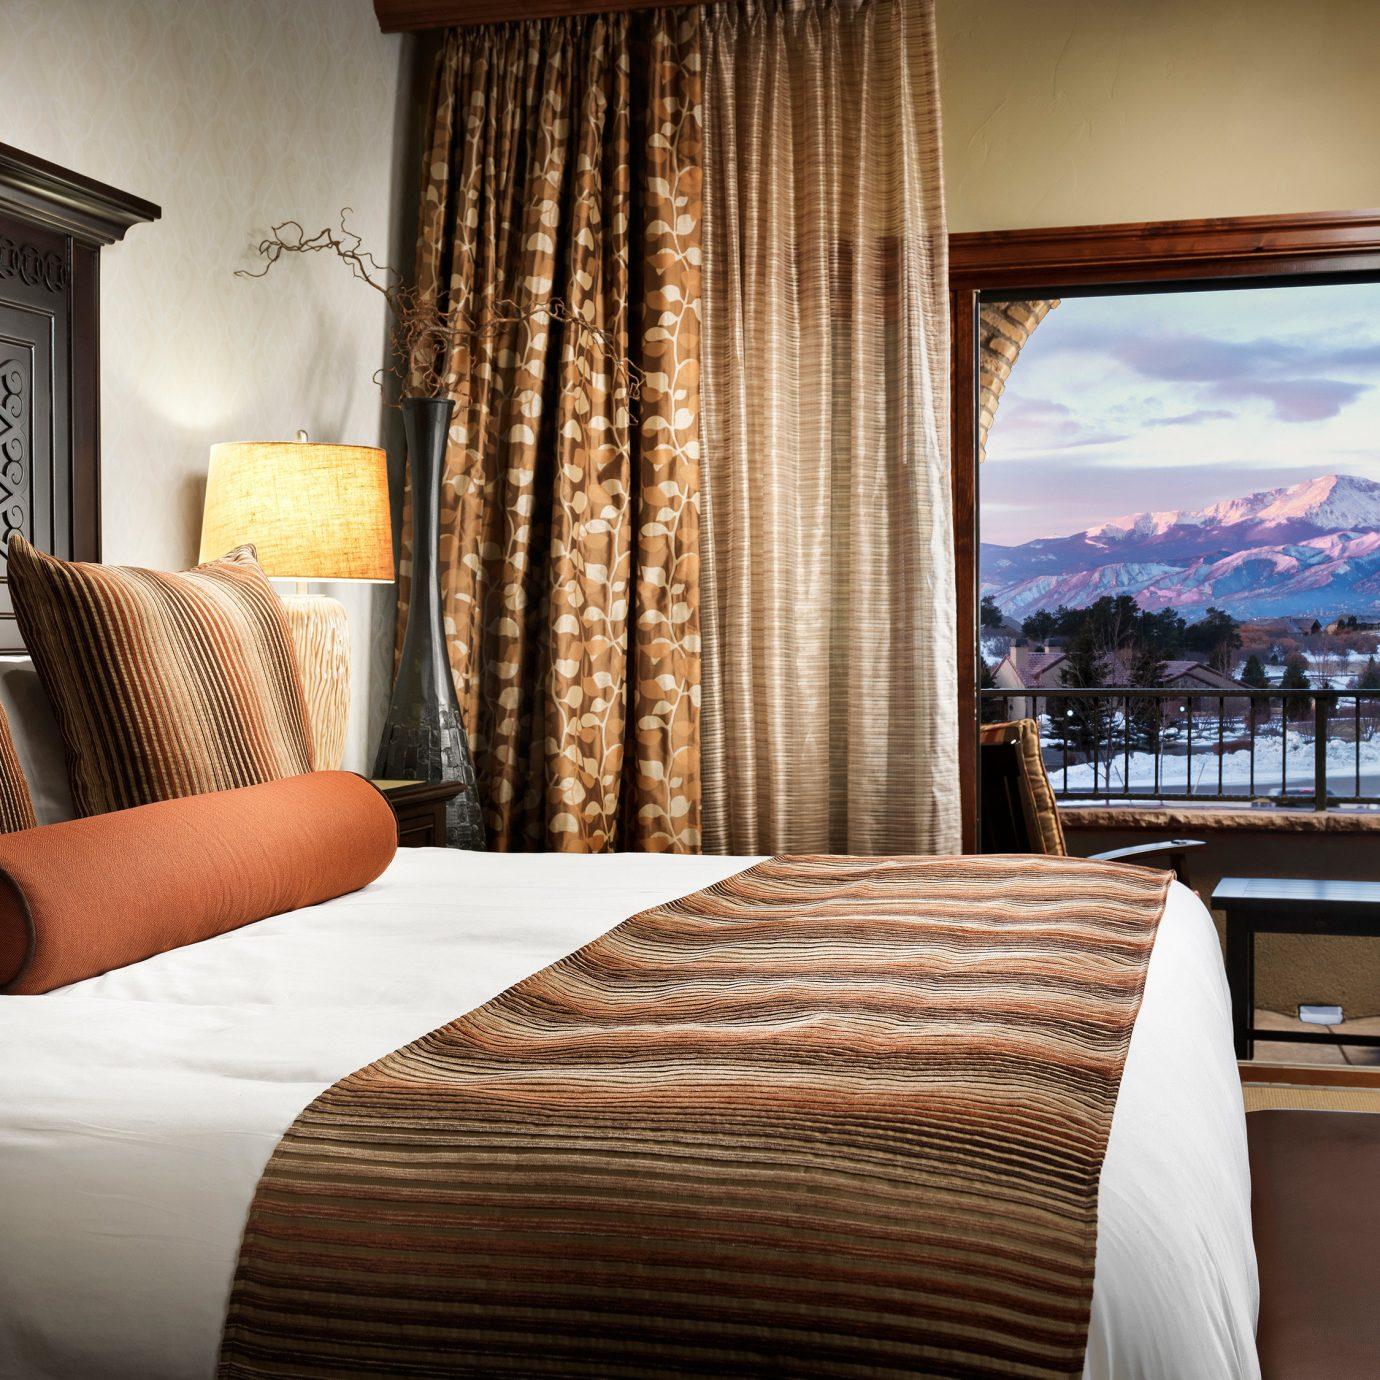 sofa property Bedroom Suite living room home condominium pillow window treatment curtain